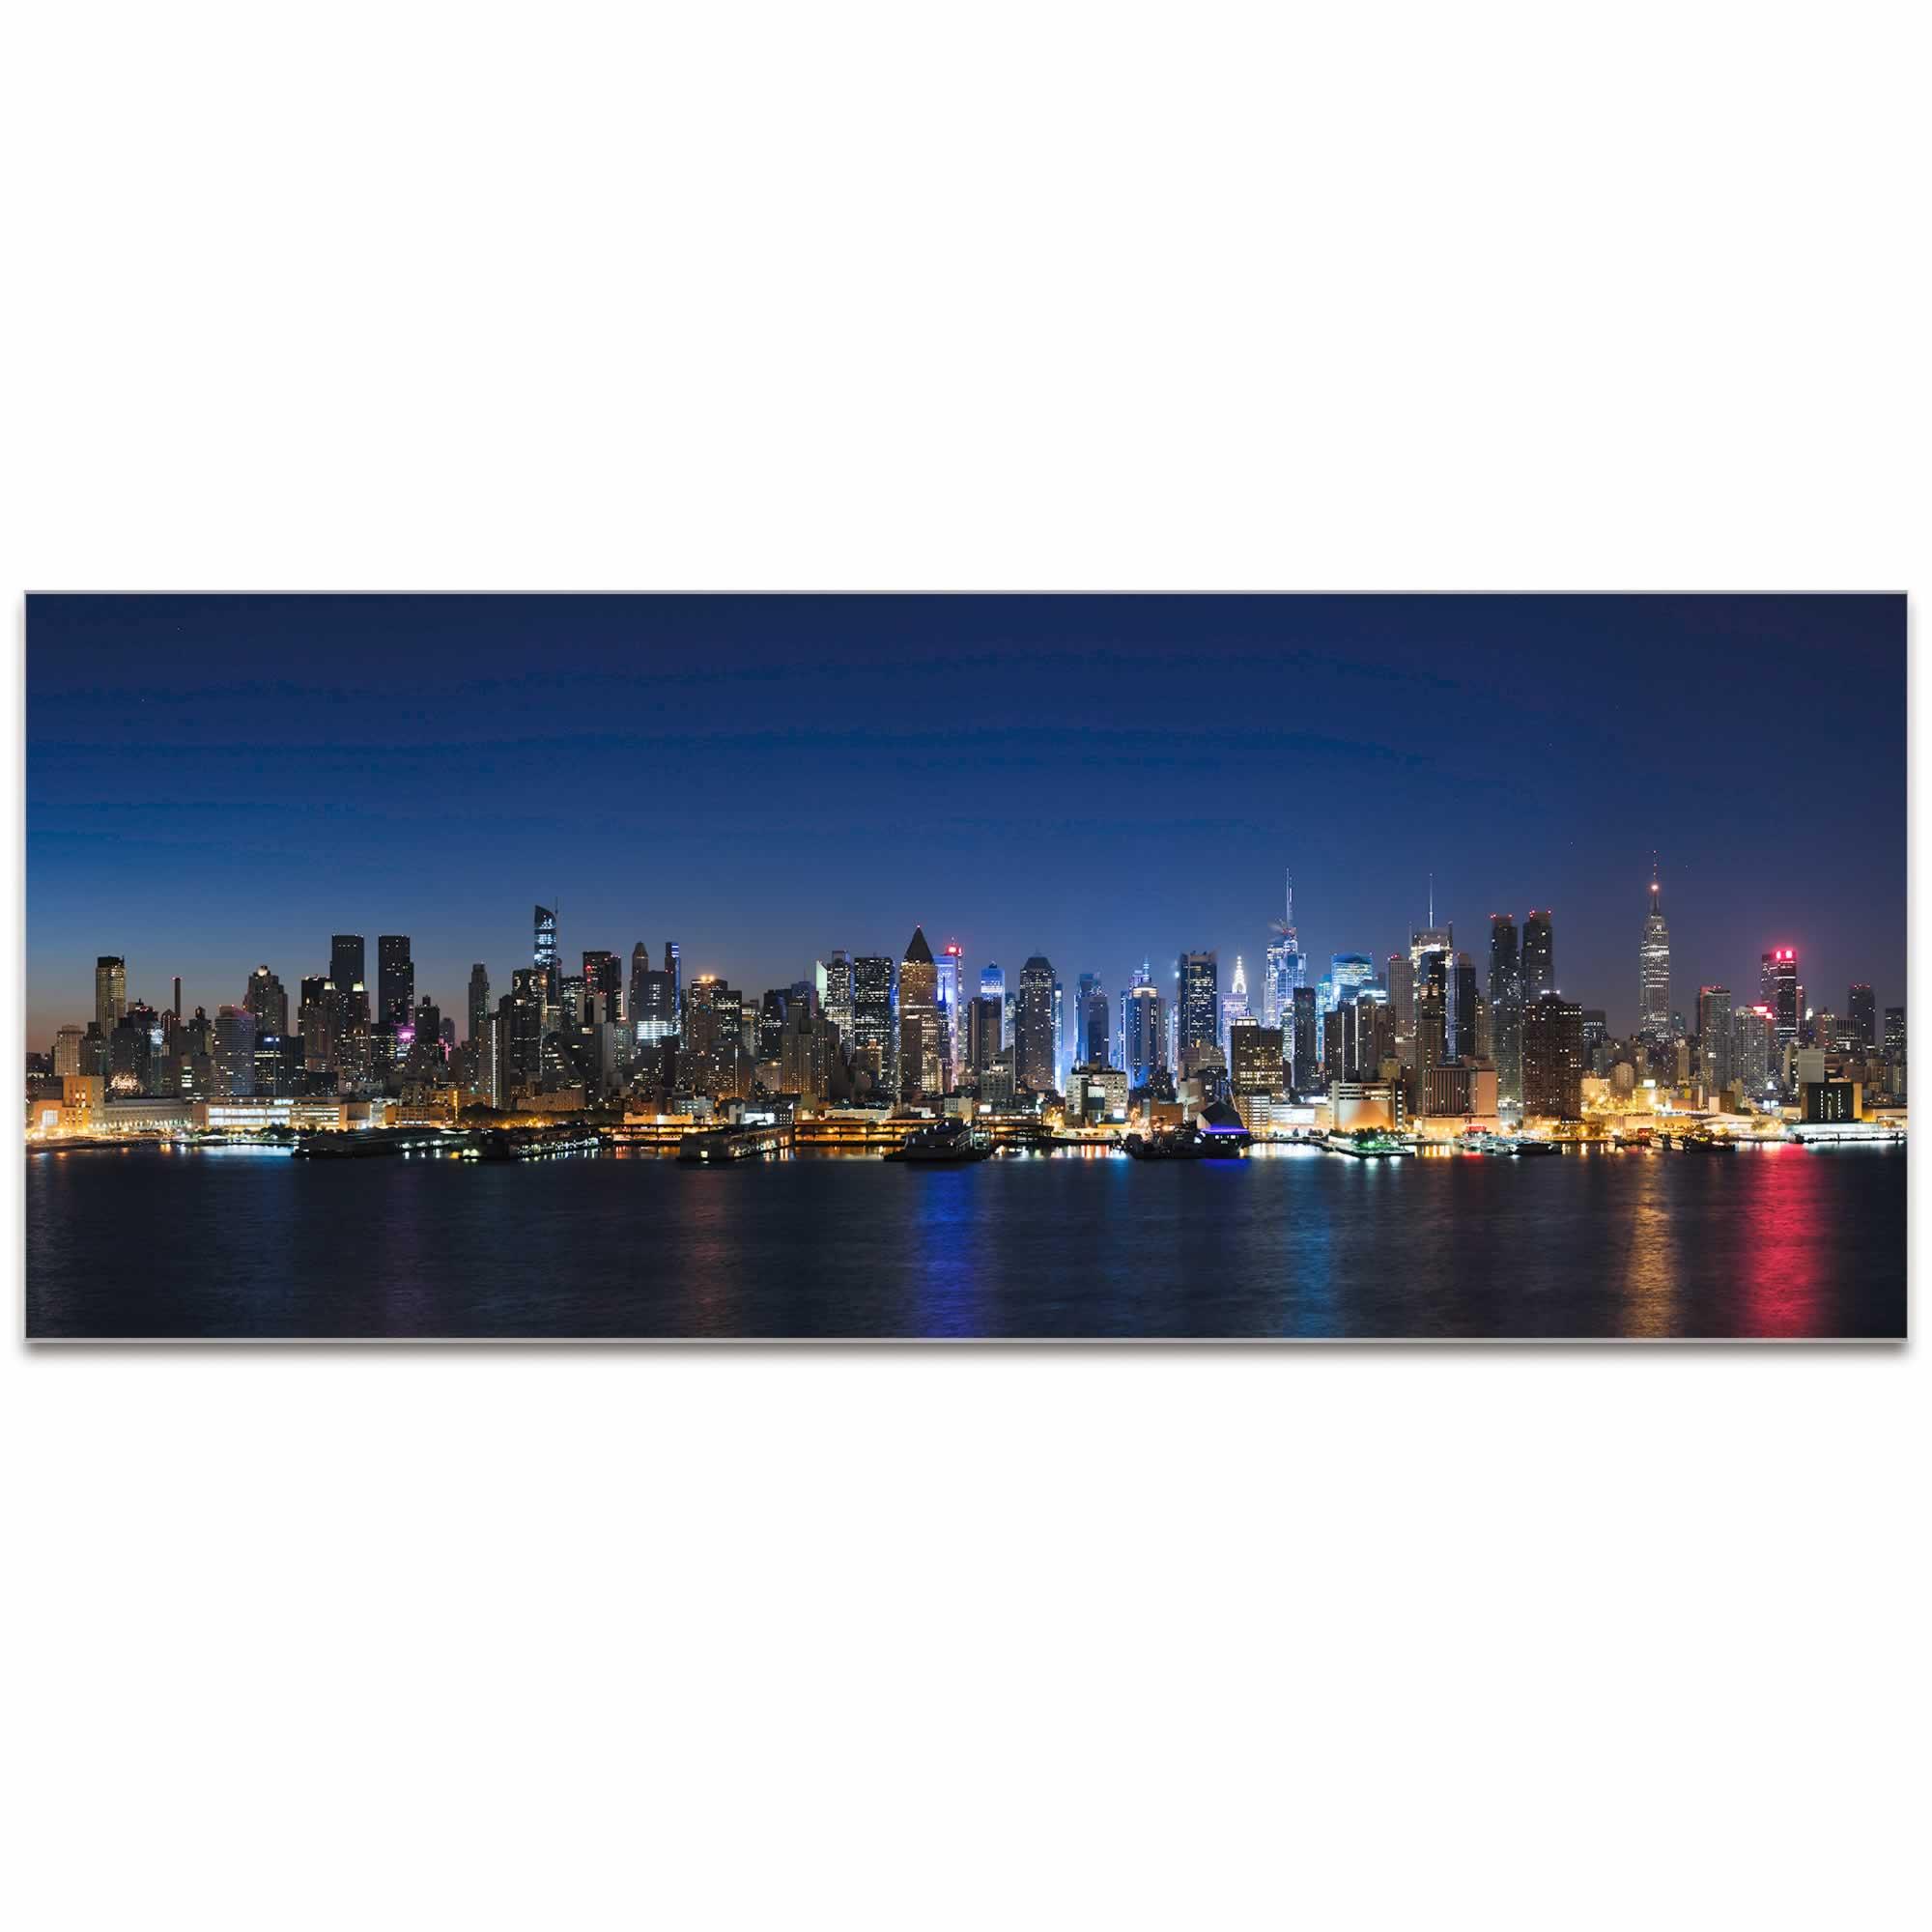 New York Harbor City Skyline - Urban Modern Art, Designer Home Decor, Cityscape Wall Artwork, Trendy Contemporary Art